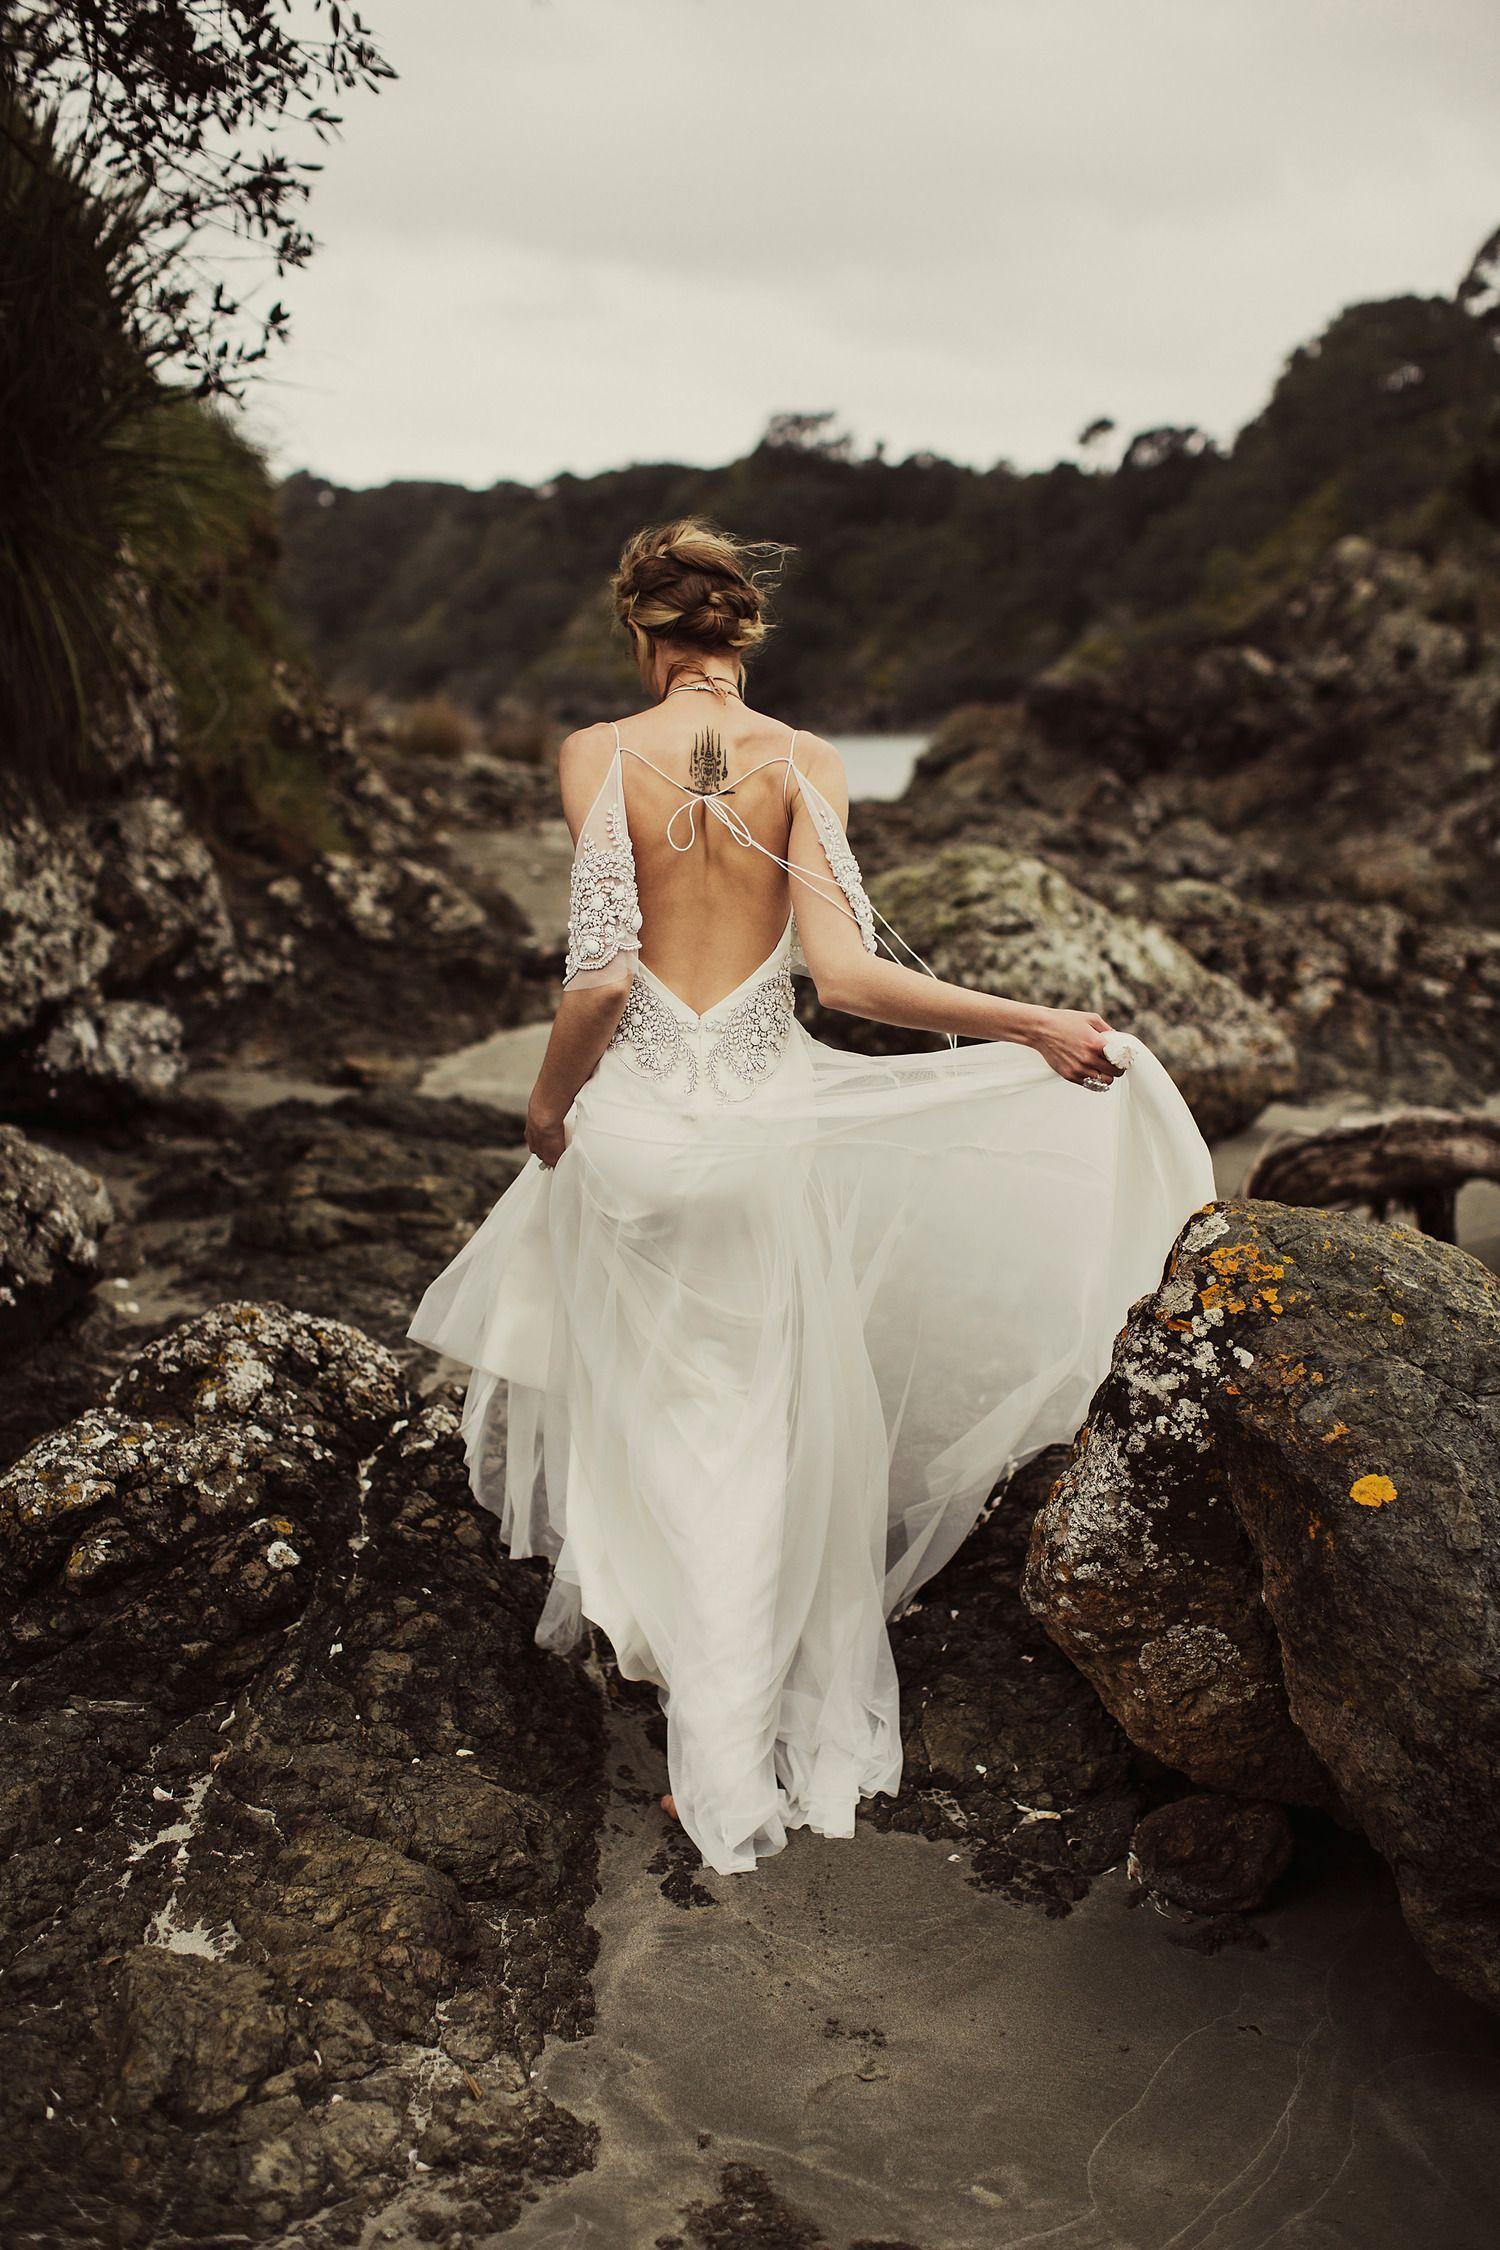 Bra for wedding dress shopping  lookslikefilmQinterviewdanellebohaneweddingphotography